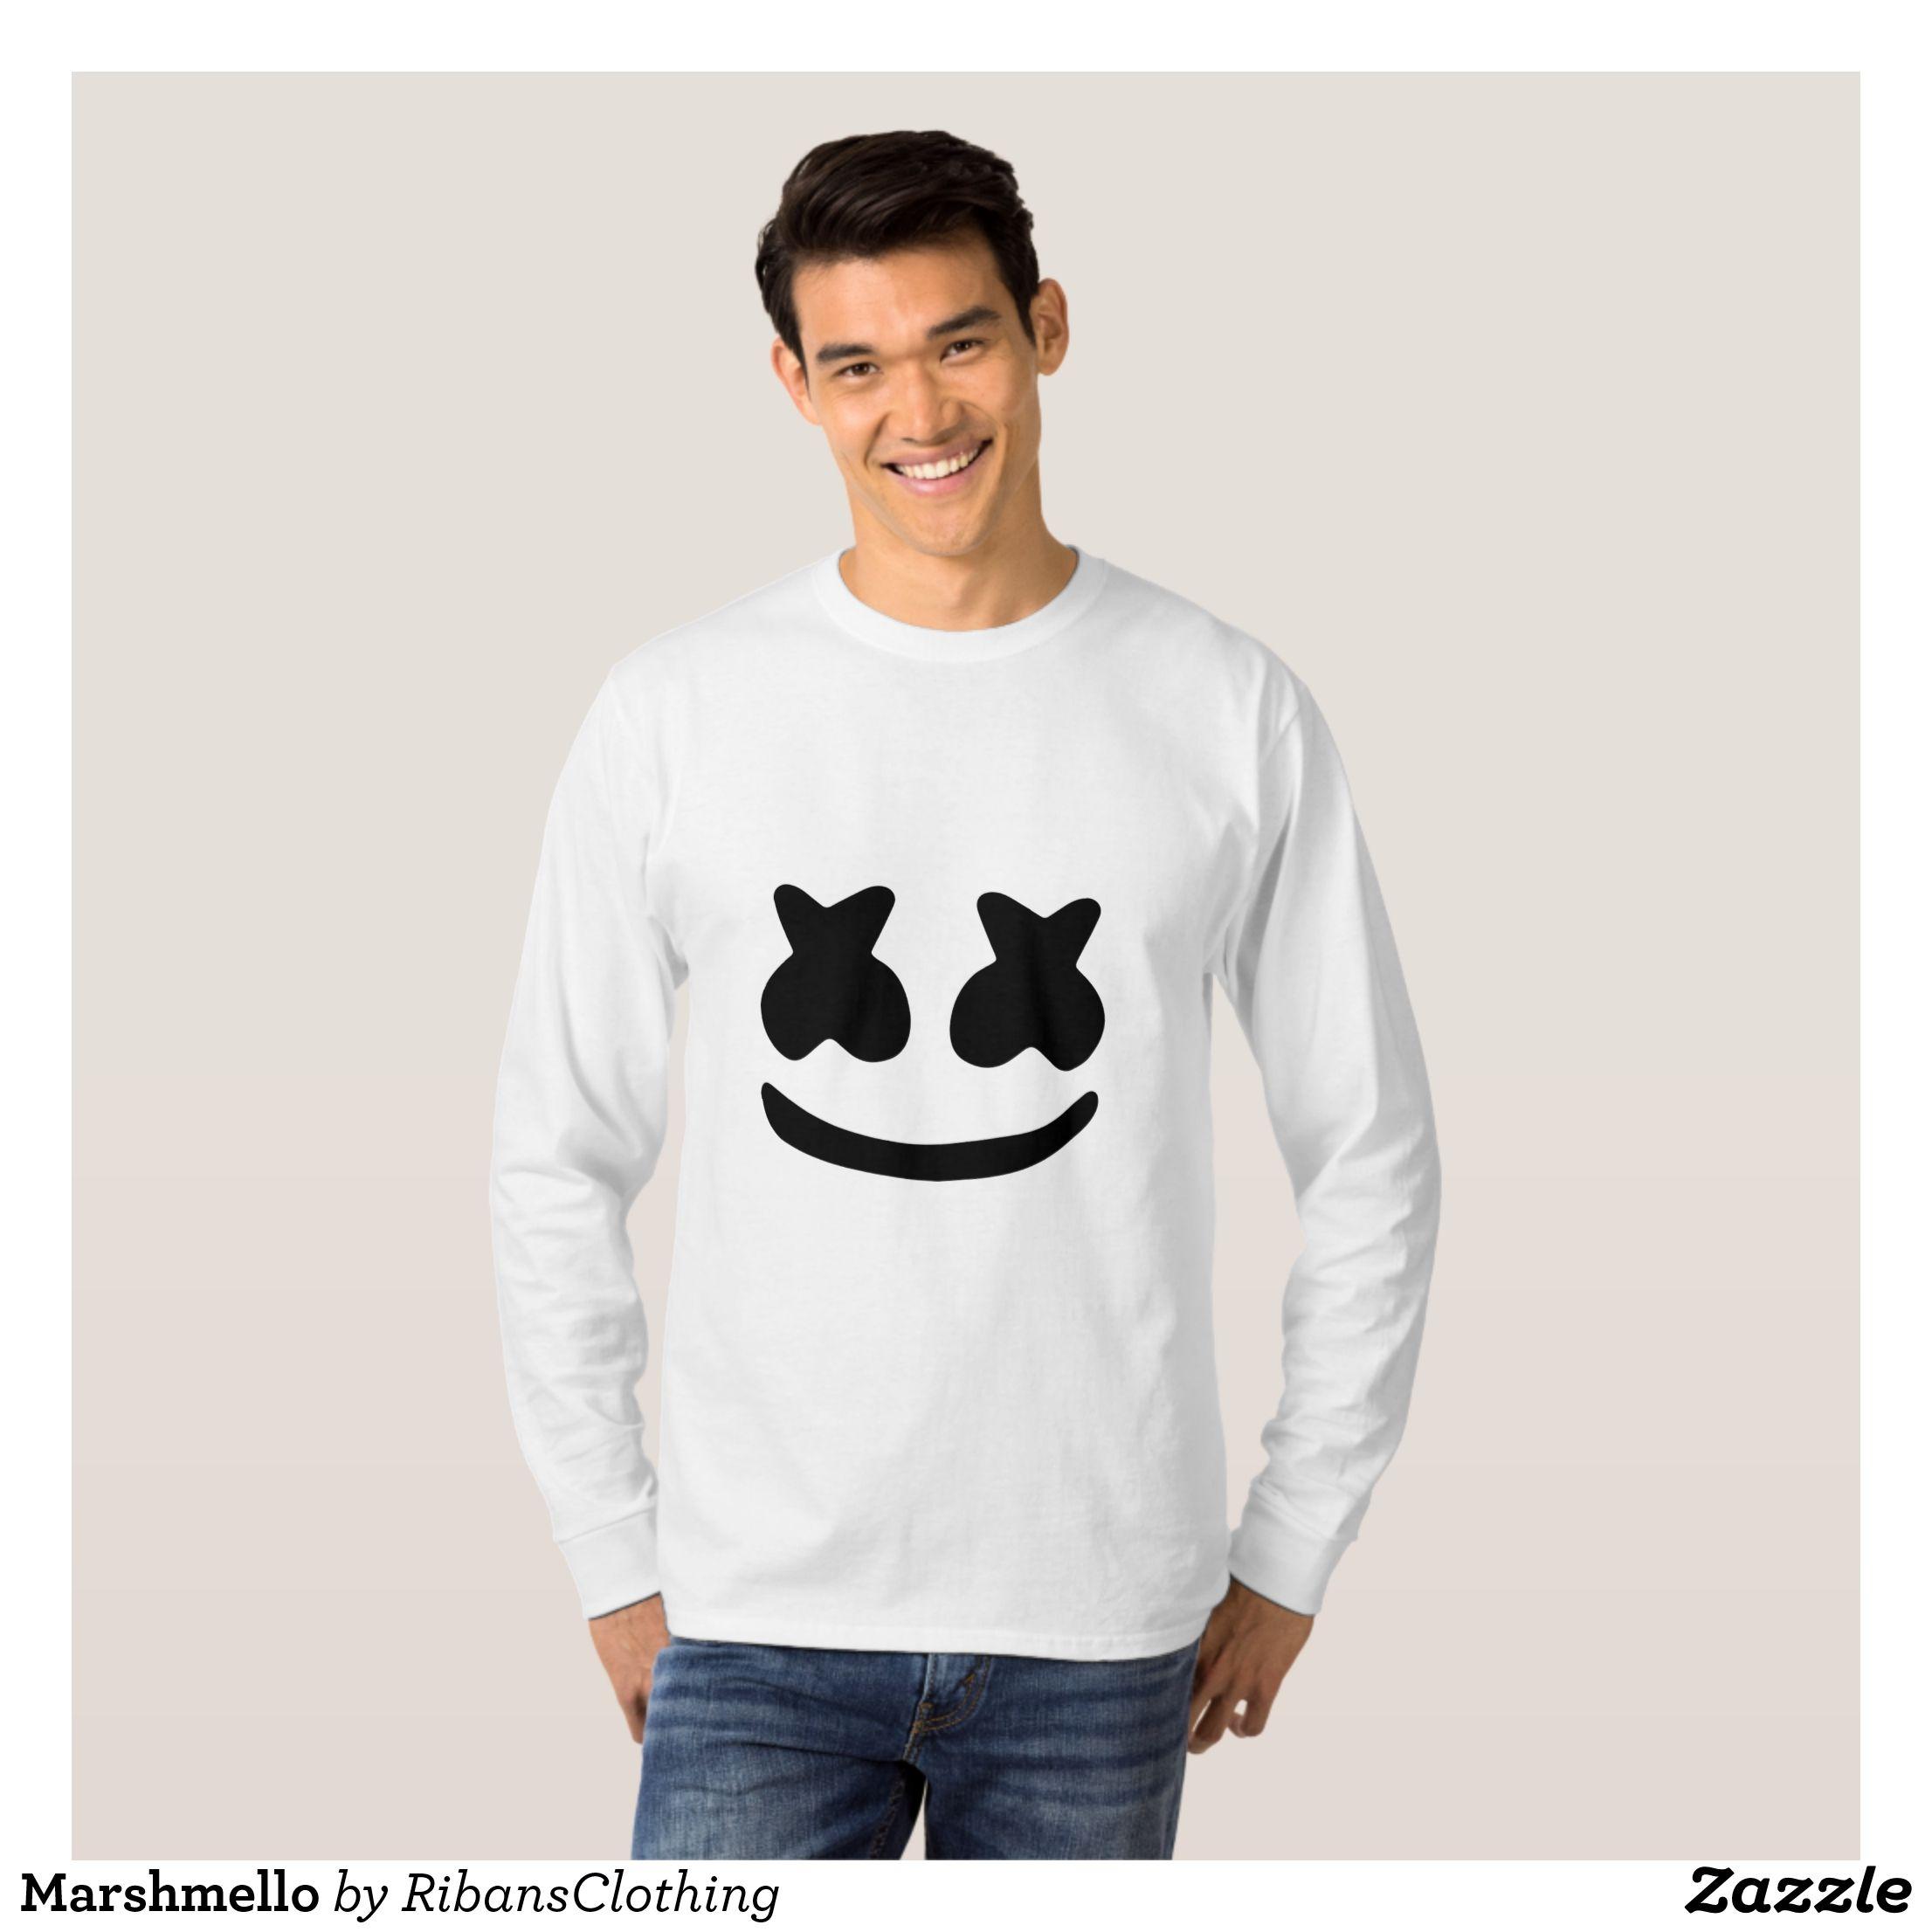 790c1927 Marshmello T-Shirt - Heavyweight Pre-Shrunk Shirts By Talented Fashion &  Graphic Designers - #sweatshirts #shirts #mensfashion #apparel #shopping  #bargain ...